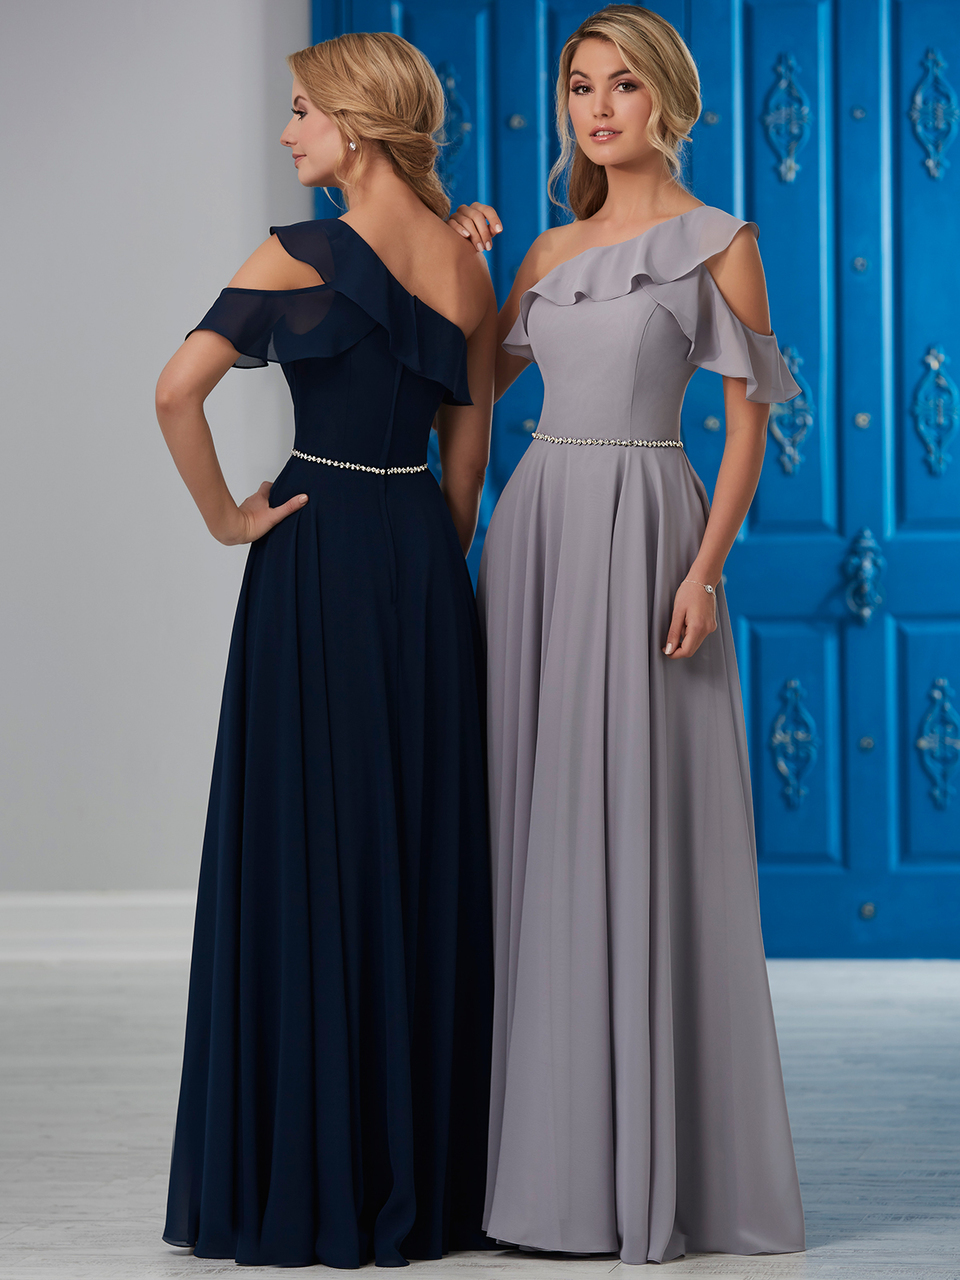 b59d0955b6 Ruffled One Shoulder Bridesmaid Dress by Christina Wu 22853